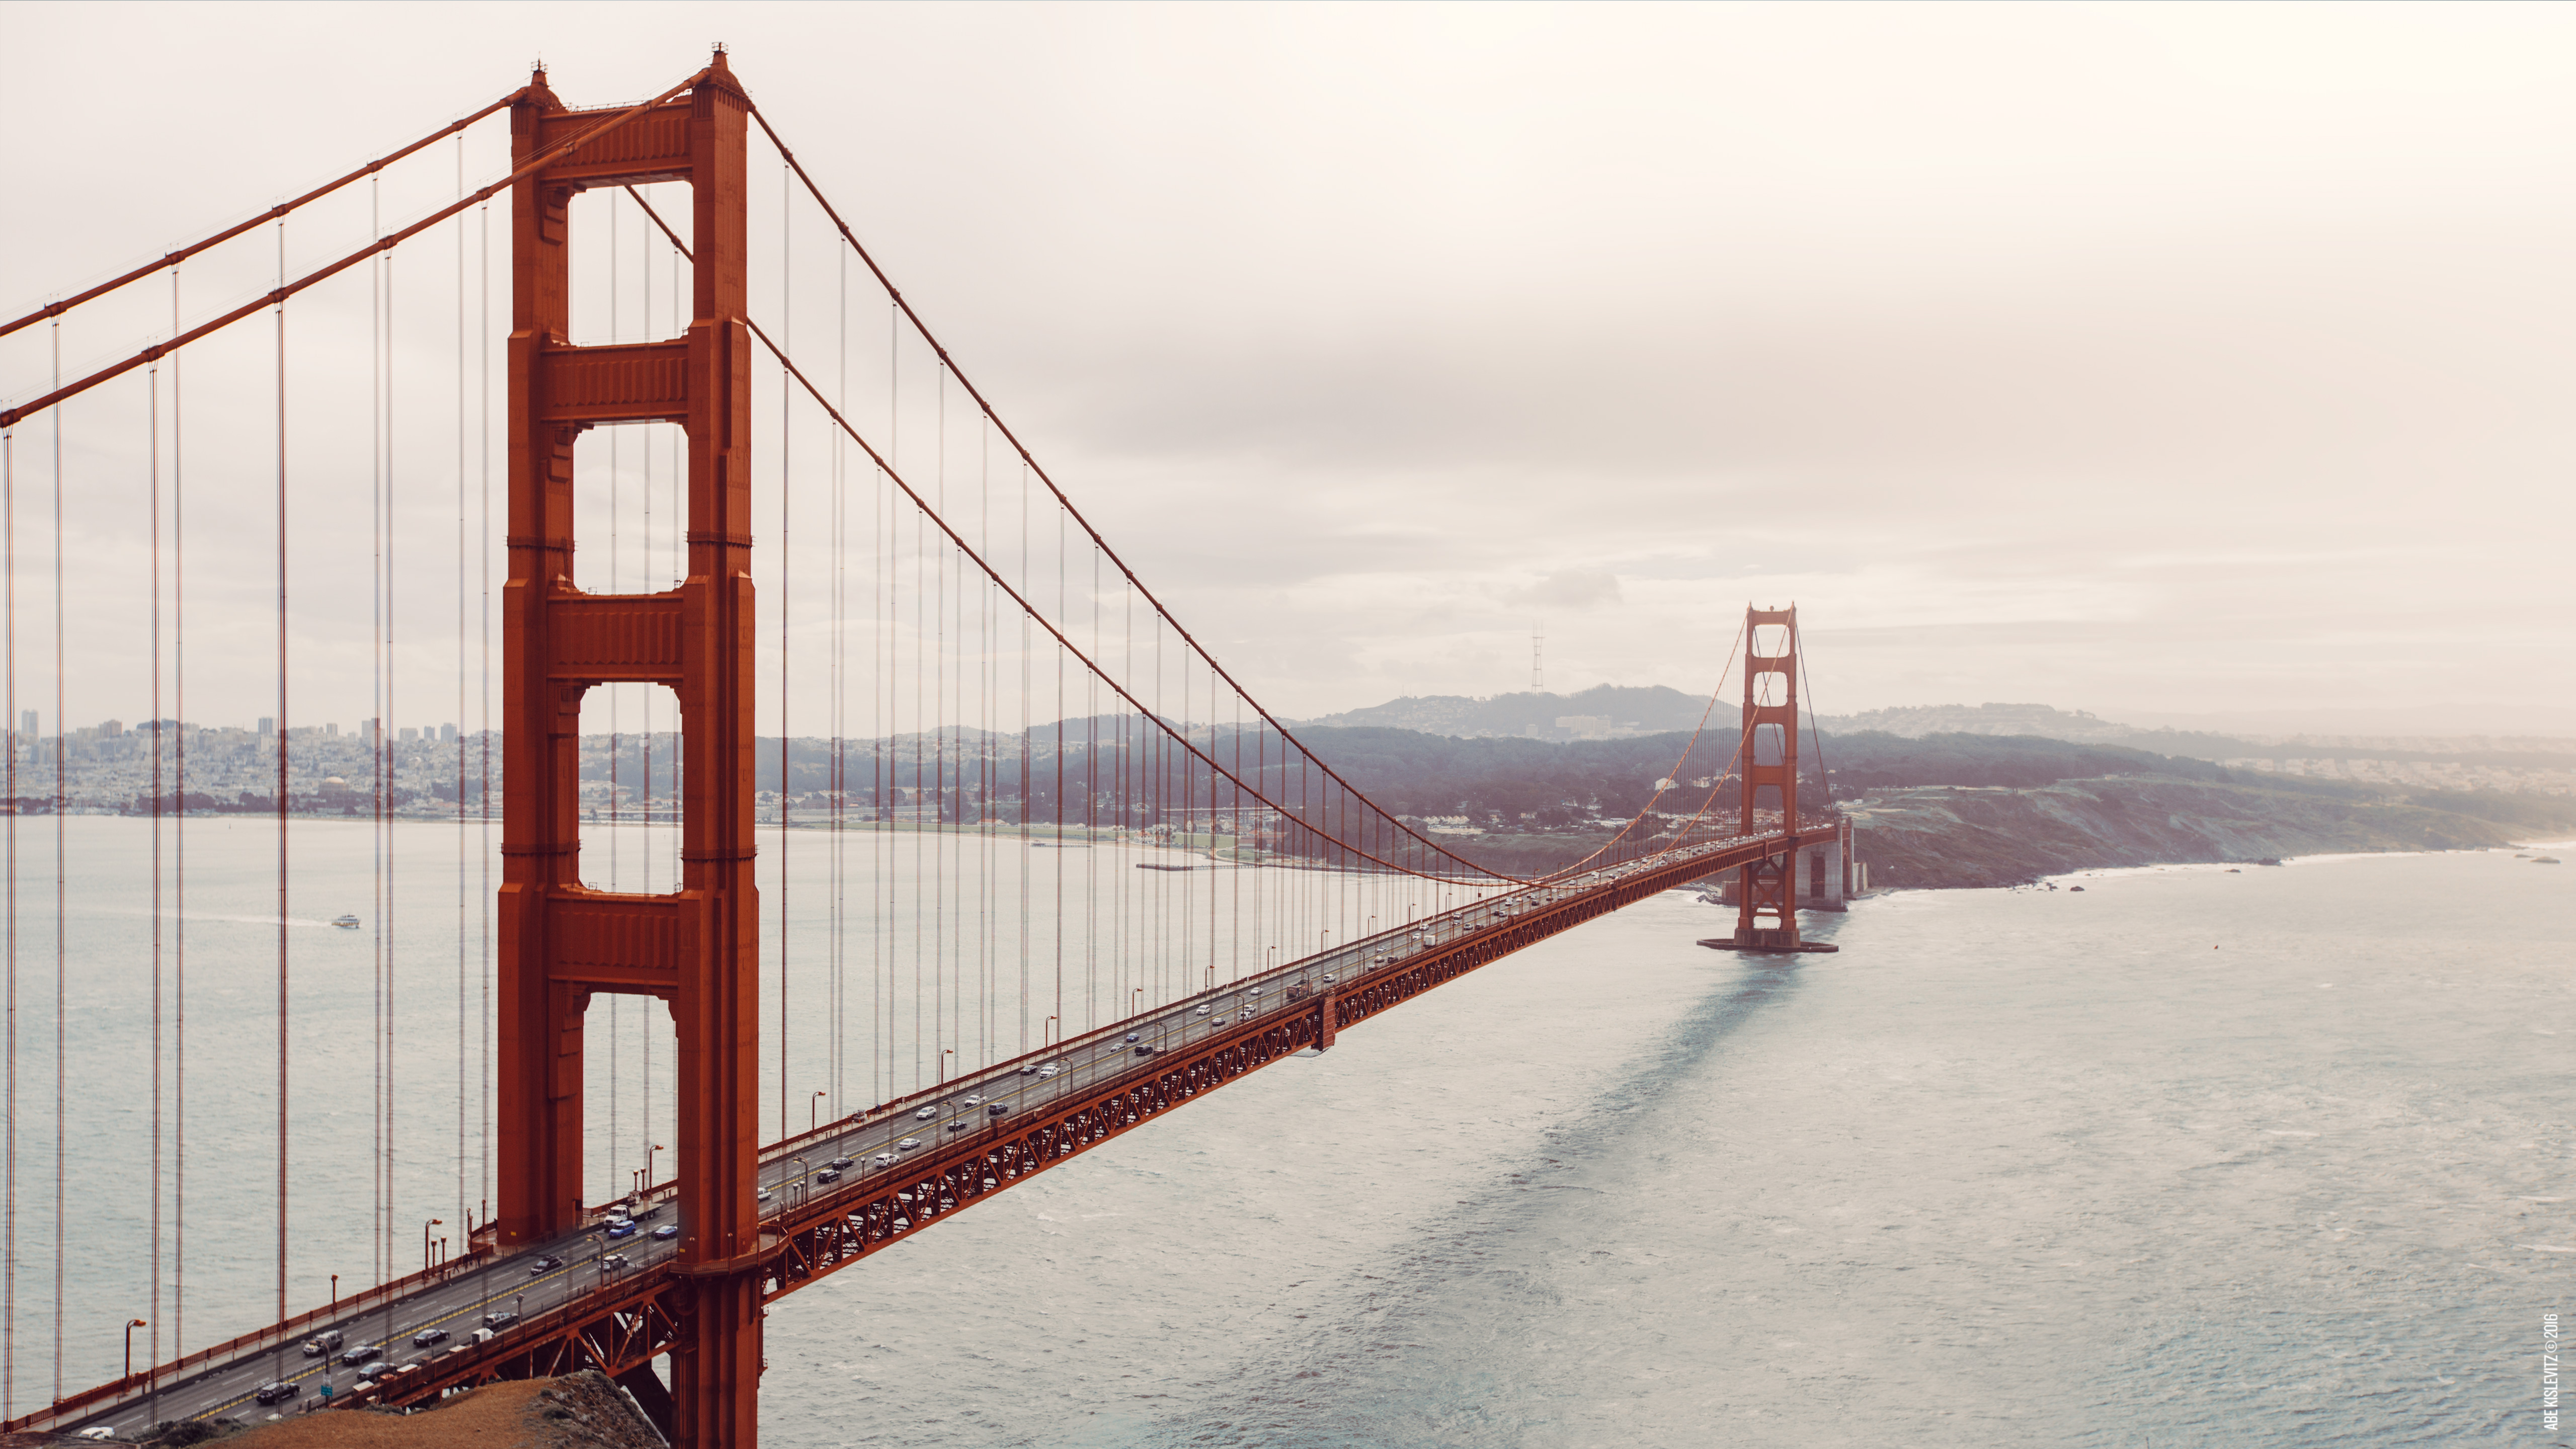 Simple Wallpaper Macbook San Francisco - AbeKislevitz_SFGGB_5K  Pic_29049.jpg